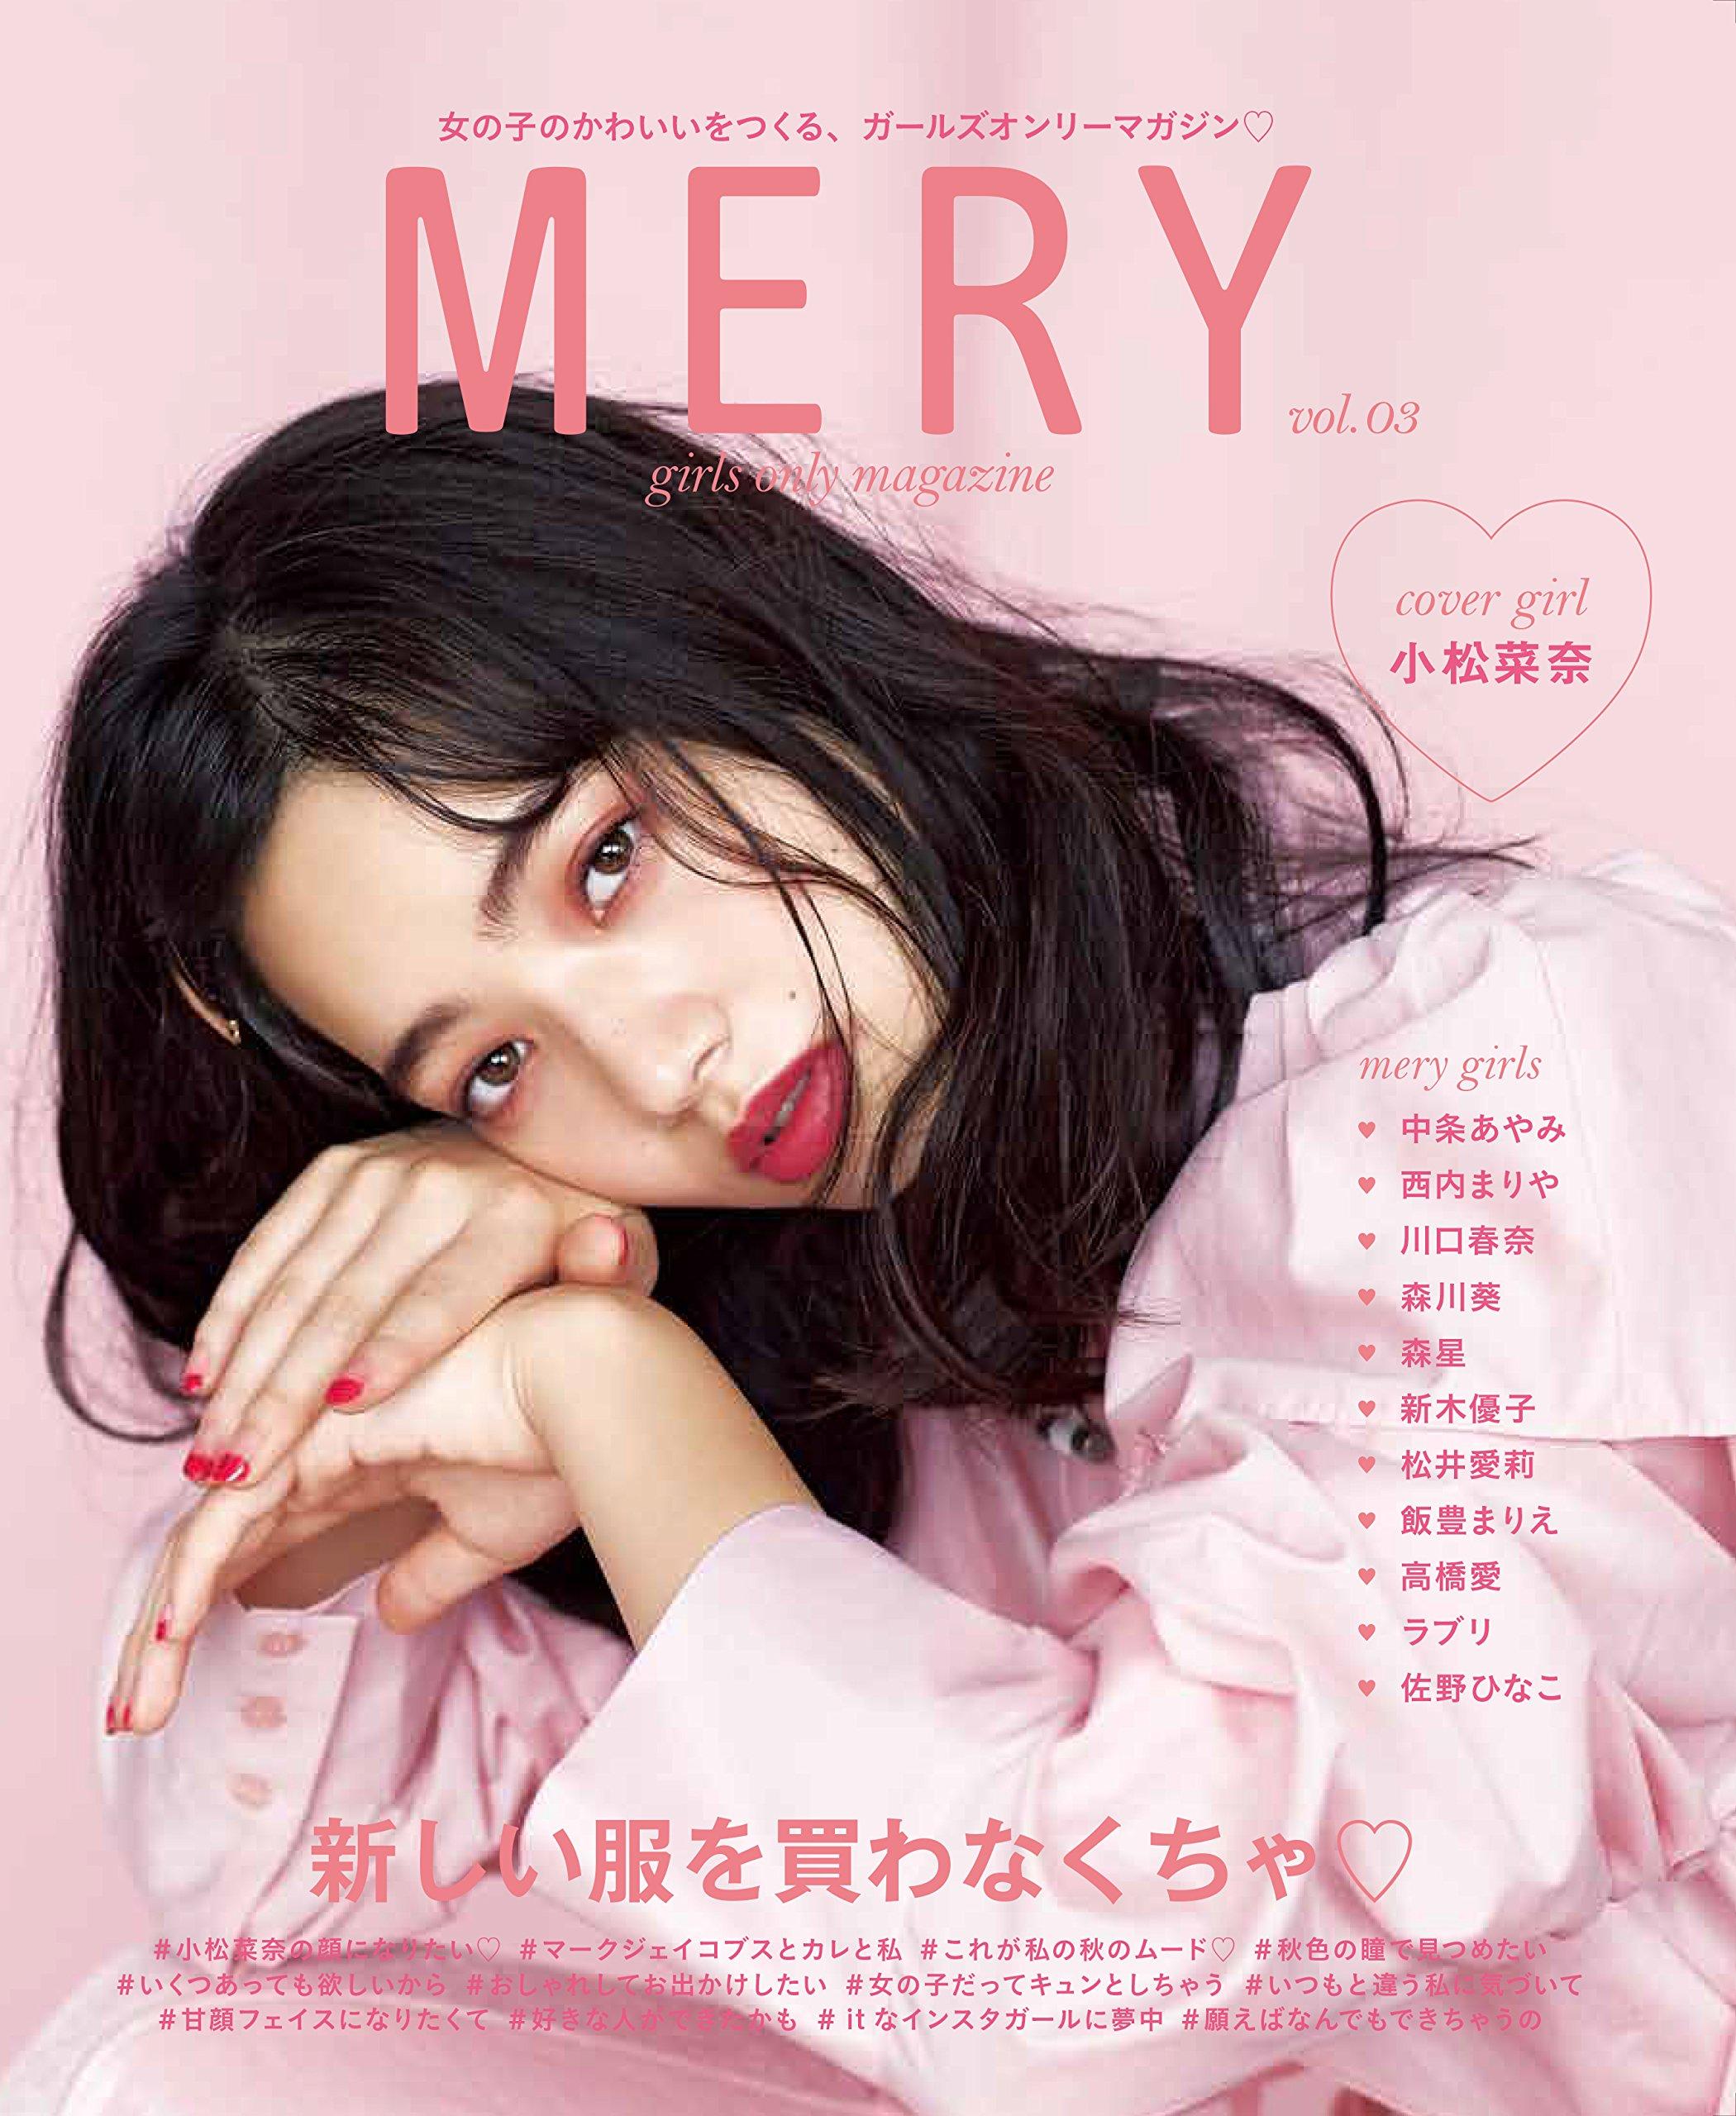 MERY、ファッション誌「MERY Vol.3」を発売。全ての企画でアプリと連動へ